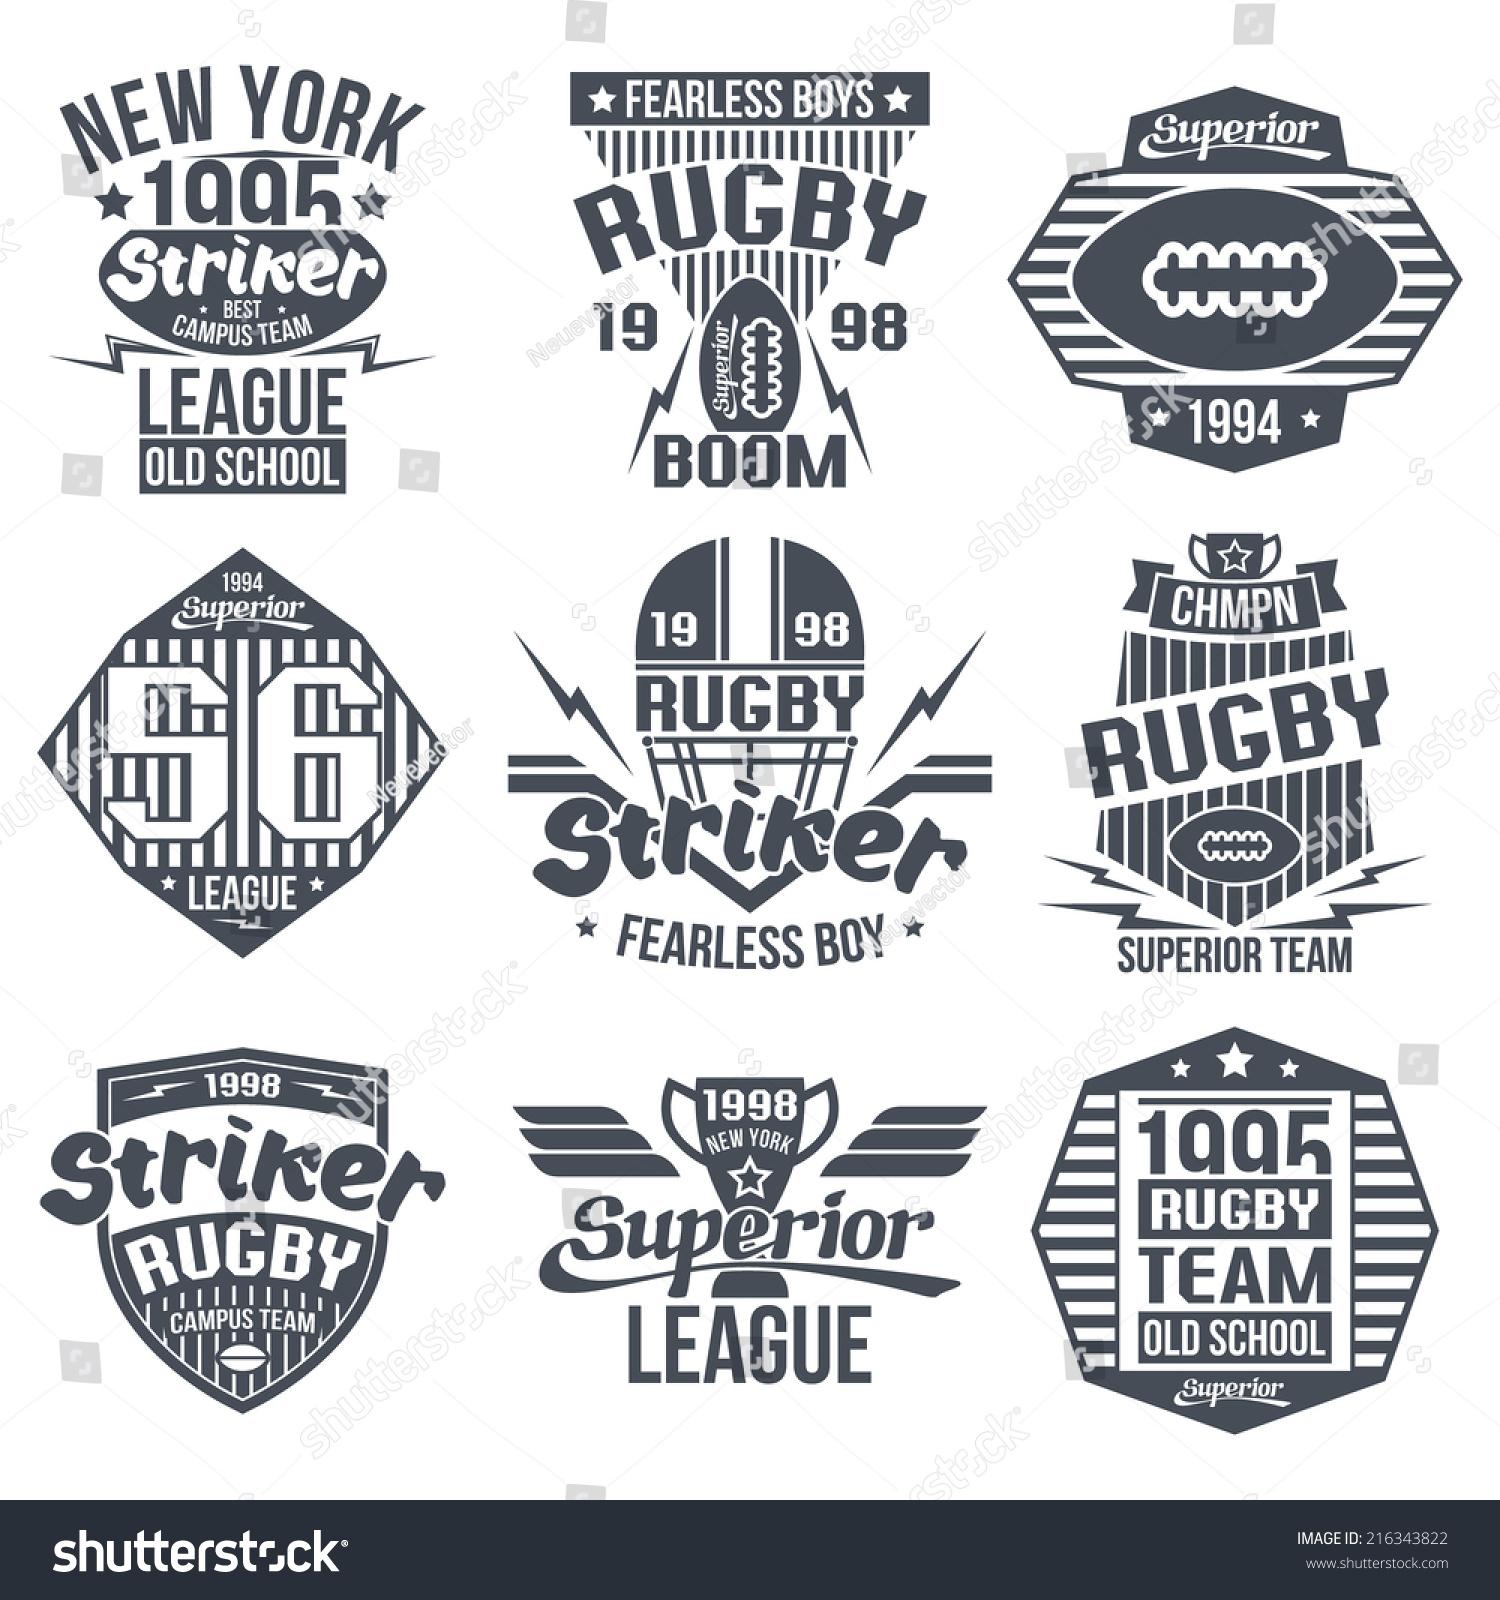 College Team American Football Retro Vintage Emblems